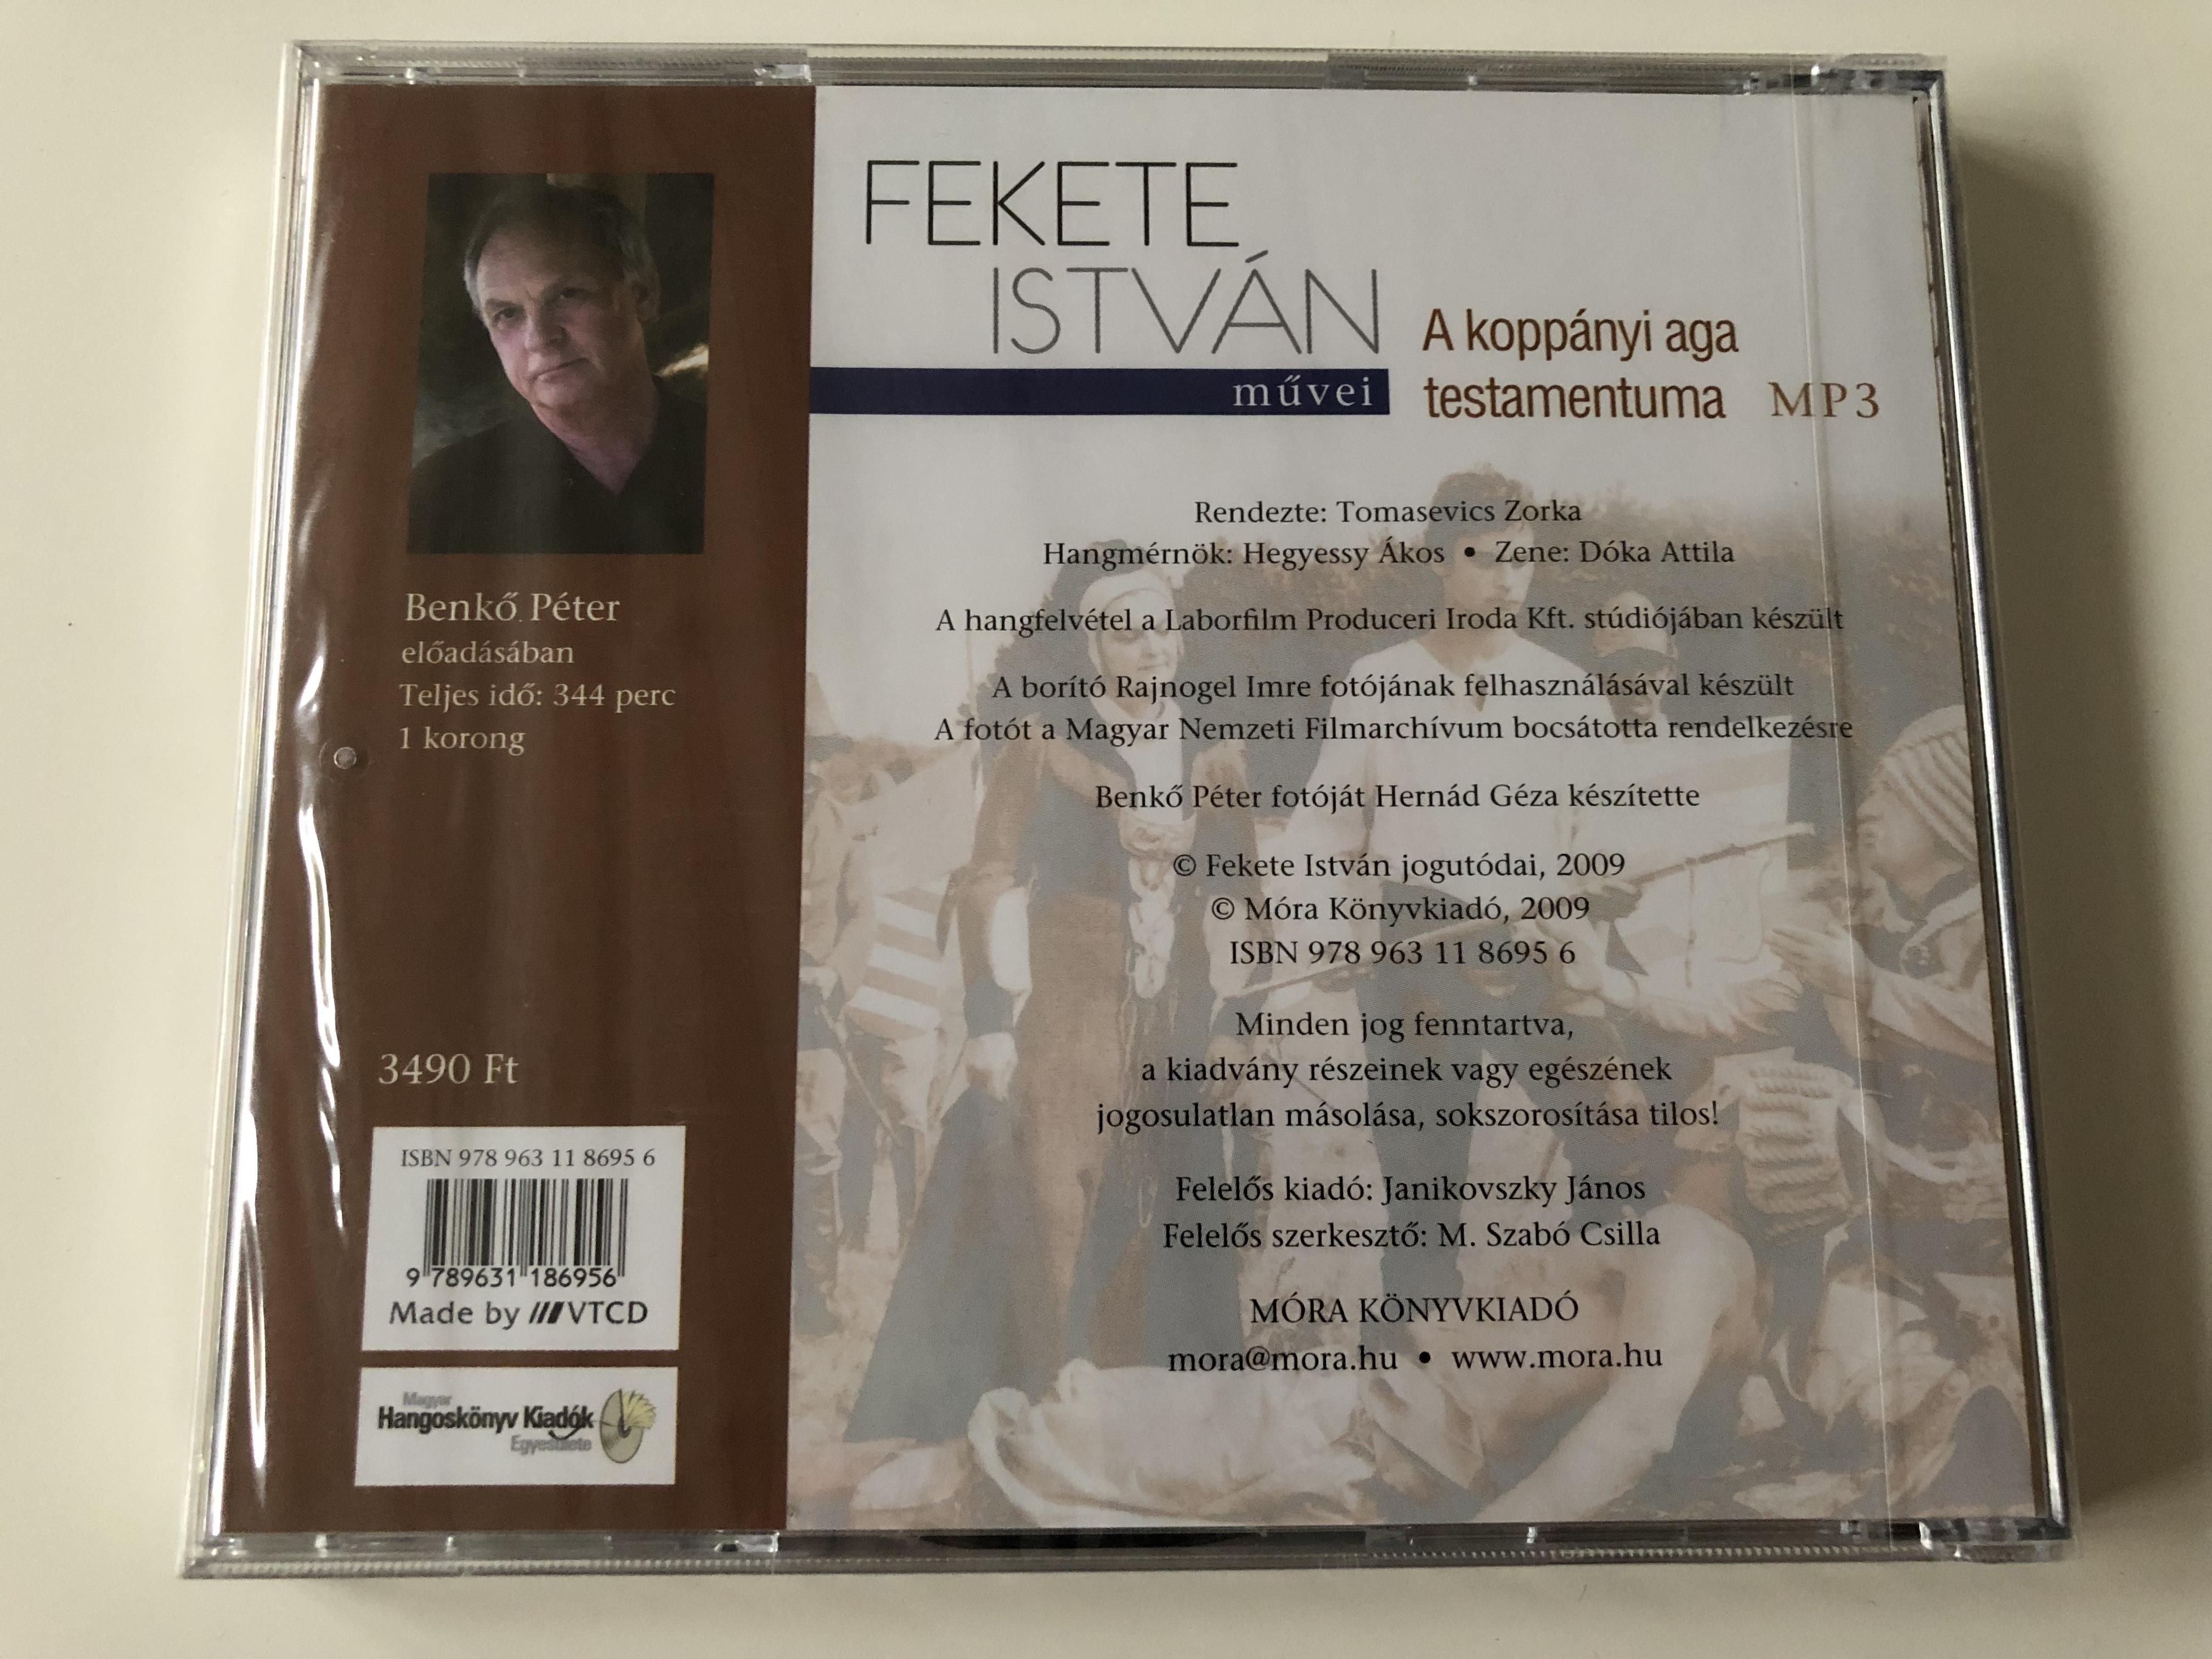 -a-kopp-nyi-aga-testamentuma-by-fekete-istv-n-hungarian-mp3-audio-book-read-by-benk-p-ter-m-ra-hangosk-nyv-2009-3-.jpg